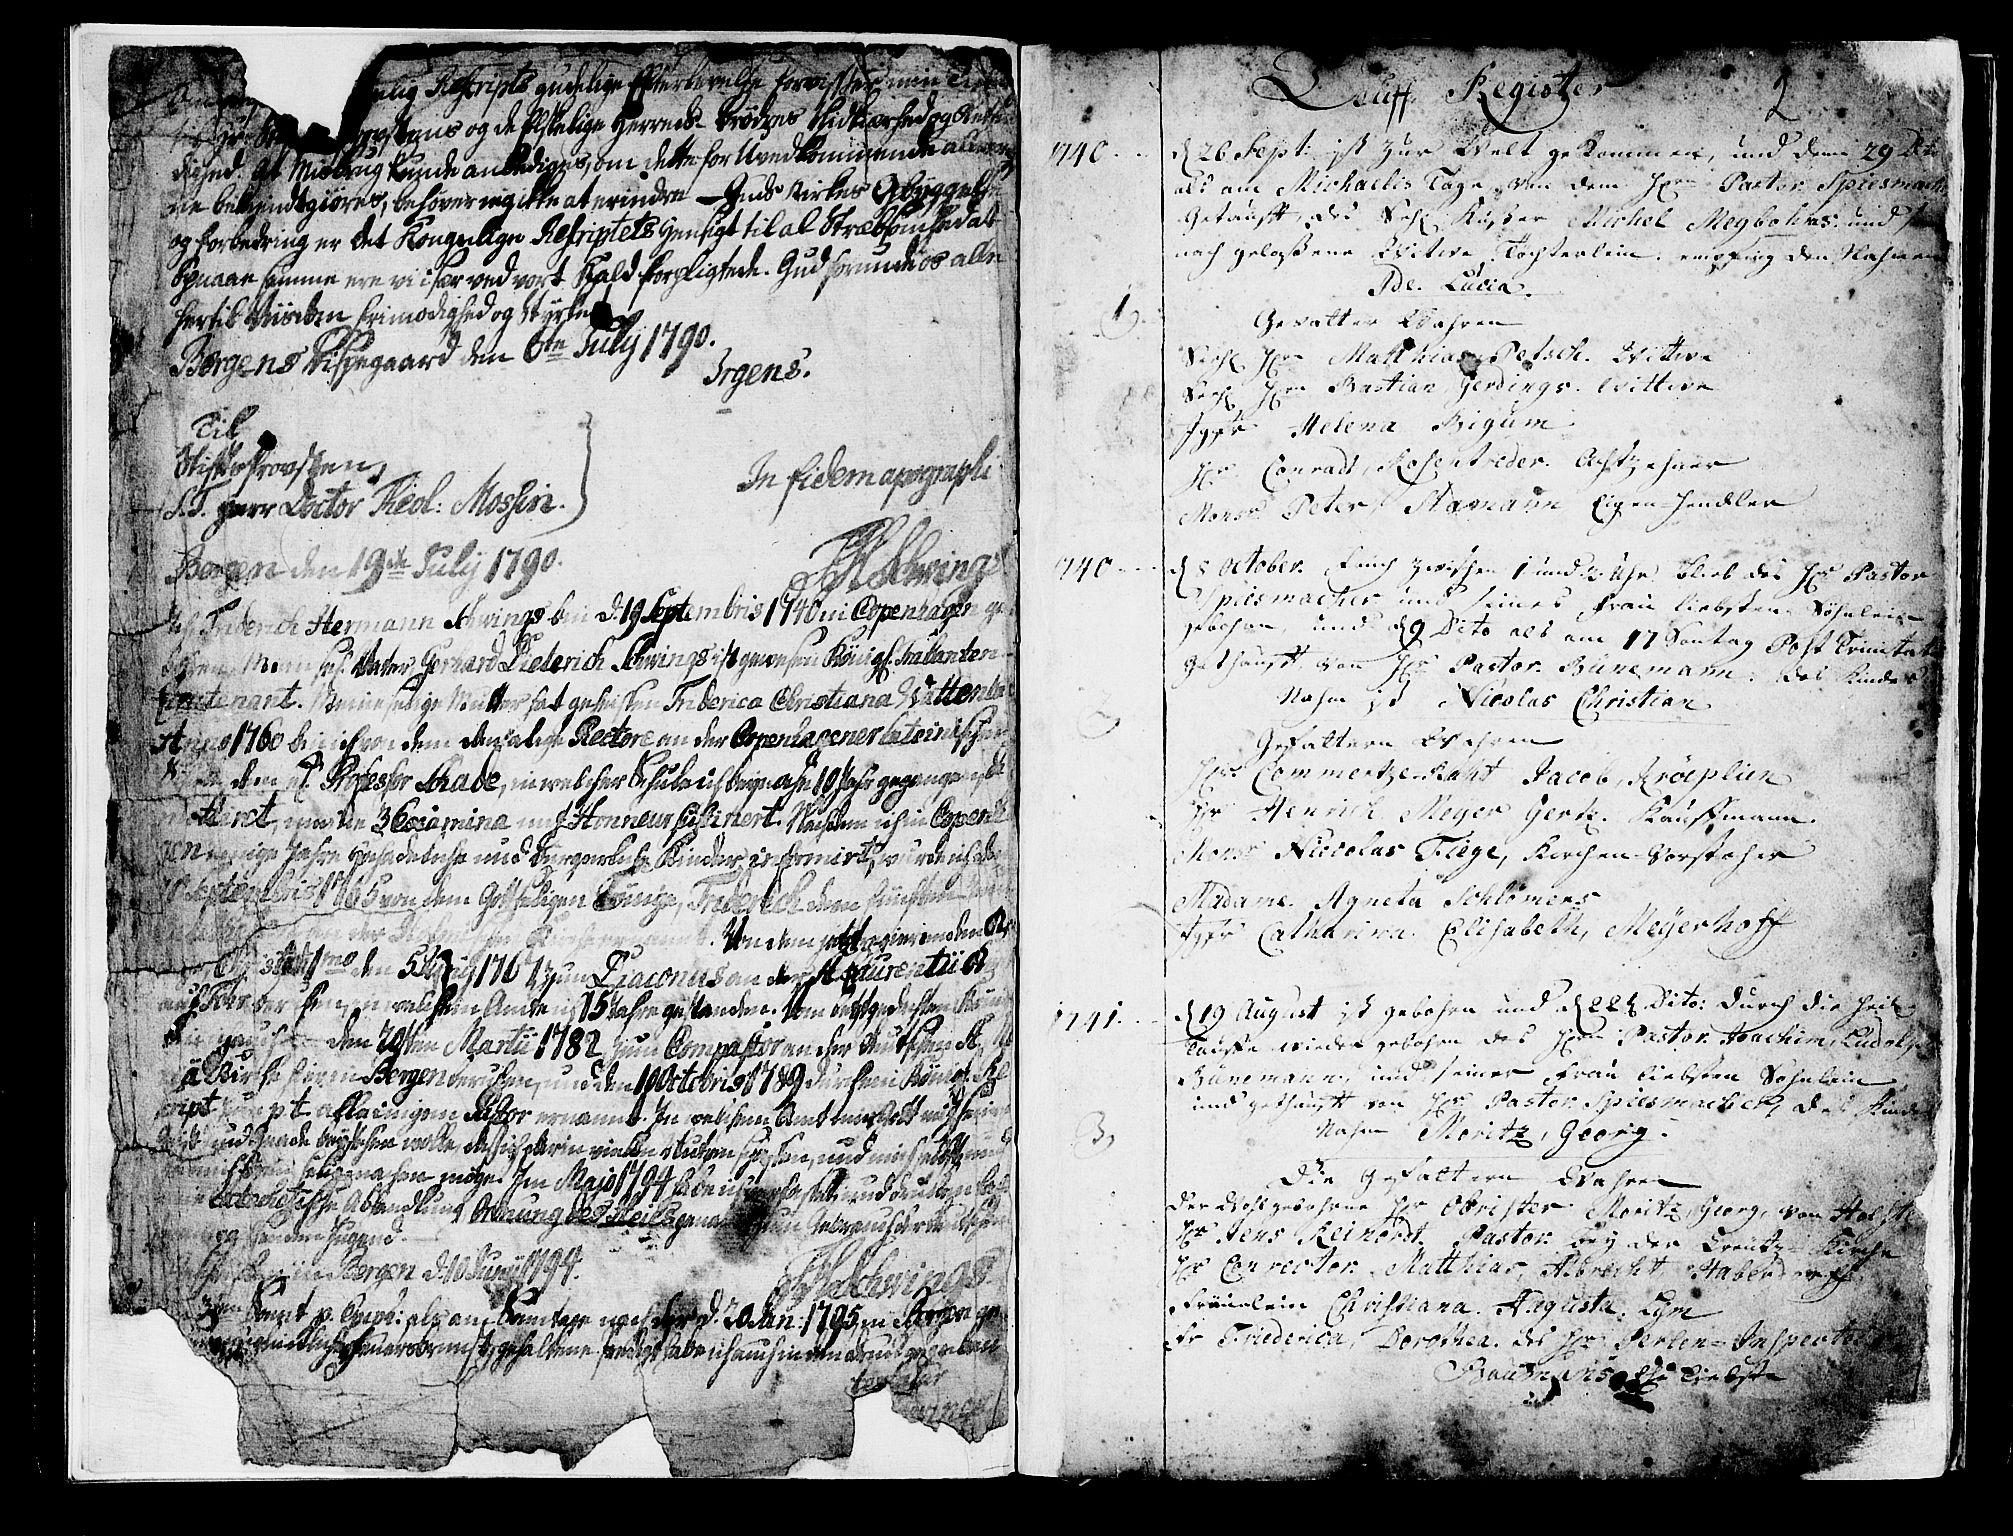 SAB, Mariakirken Sokneprestembete, H/Haa/L0001: Ministerialbok nr. A 1, 1740-1784, s. 2